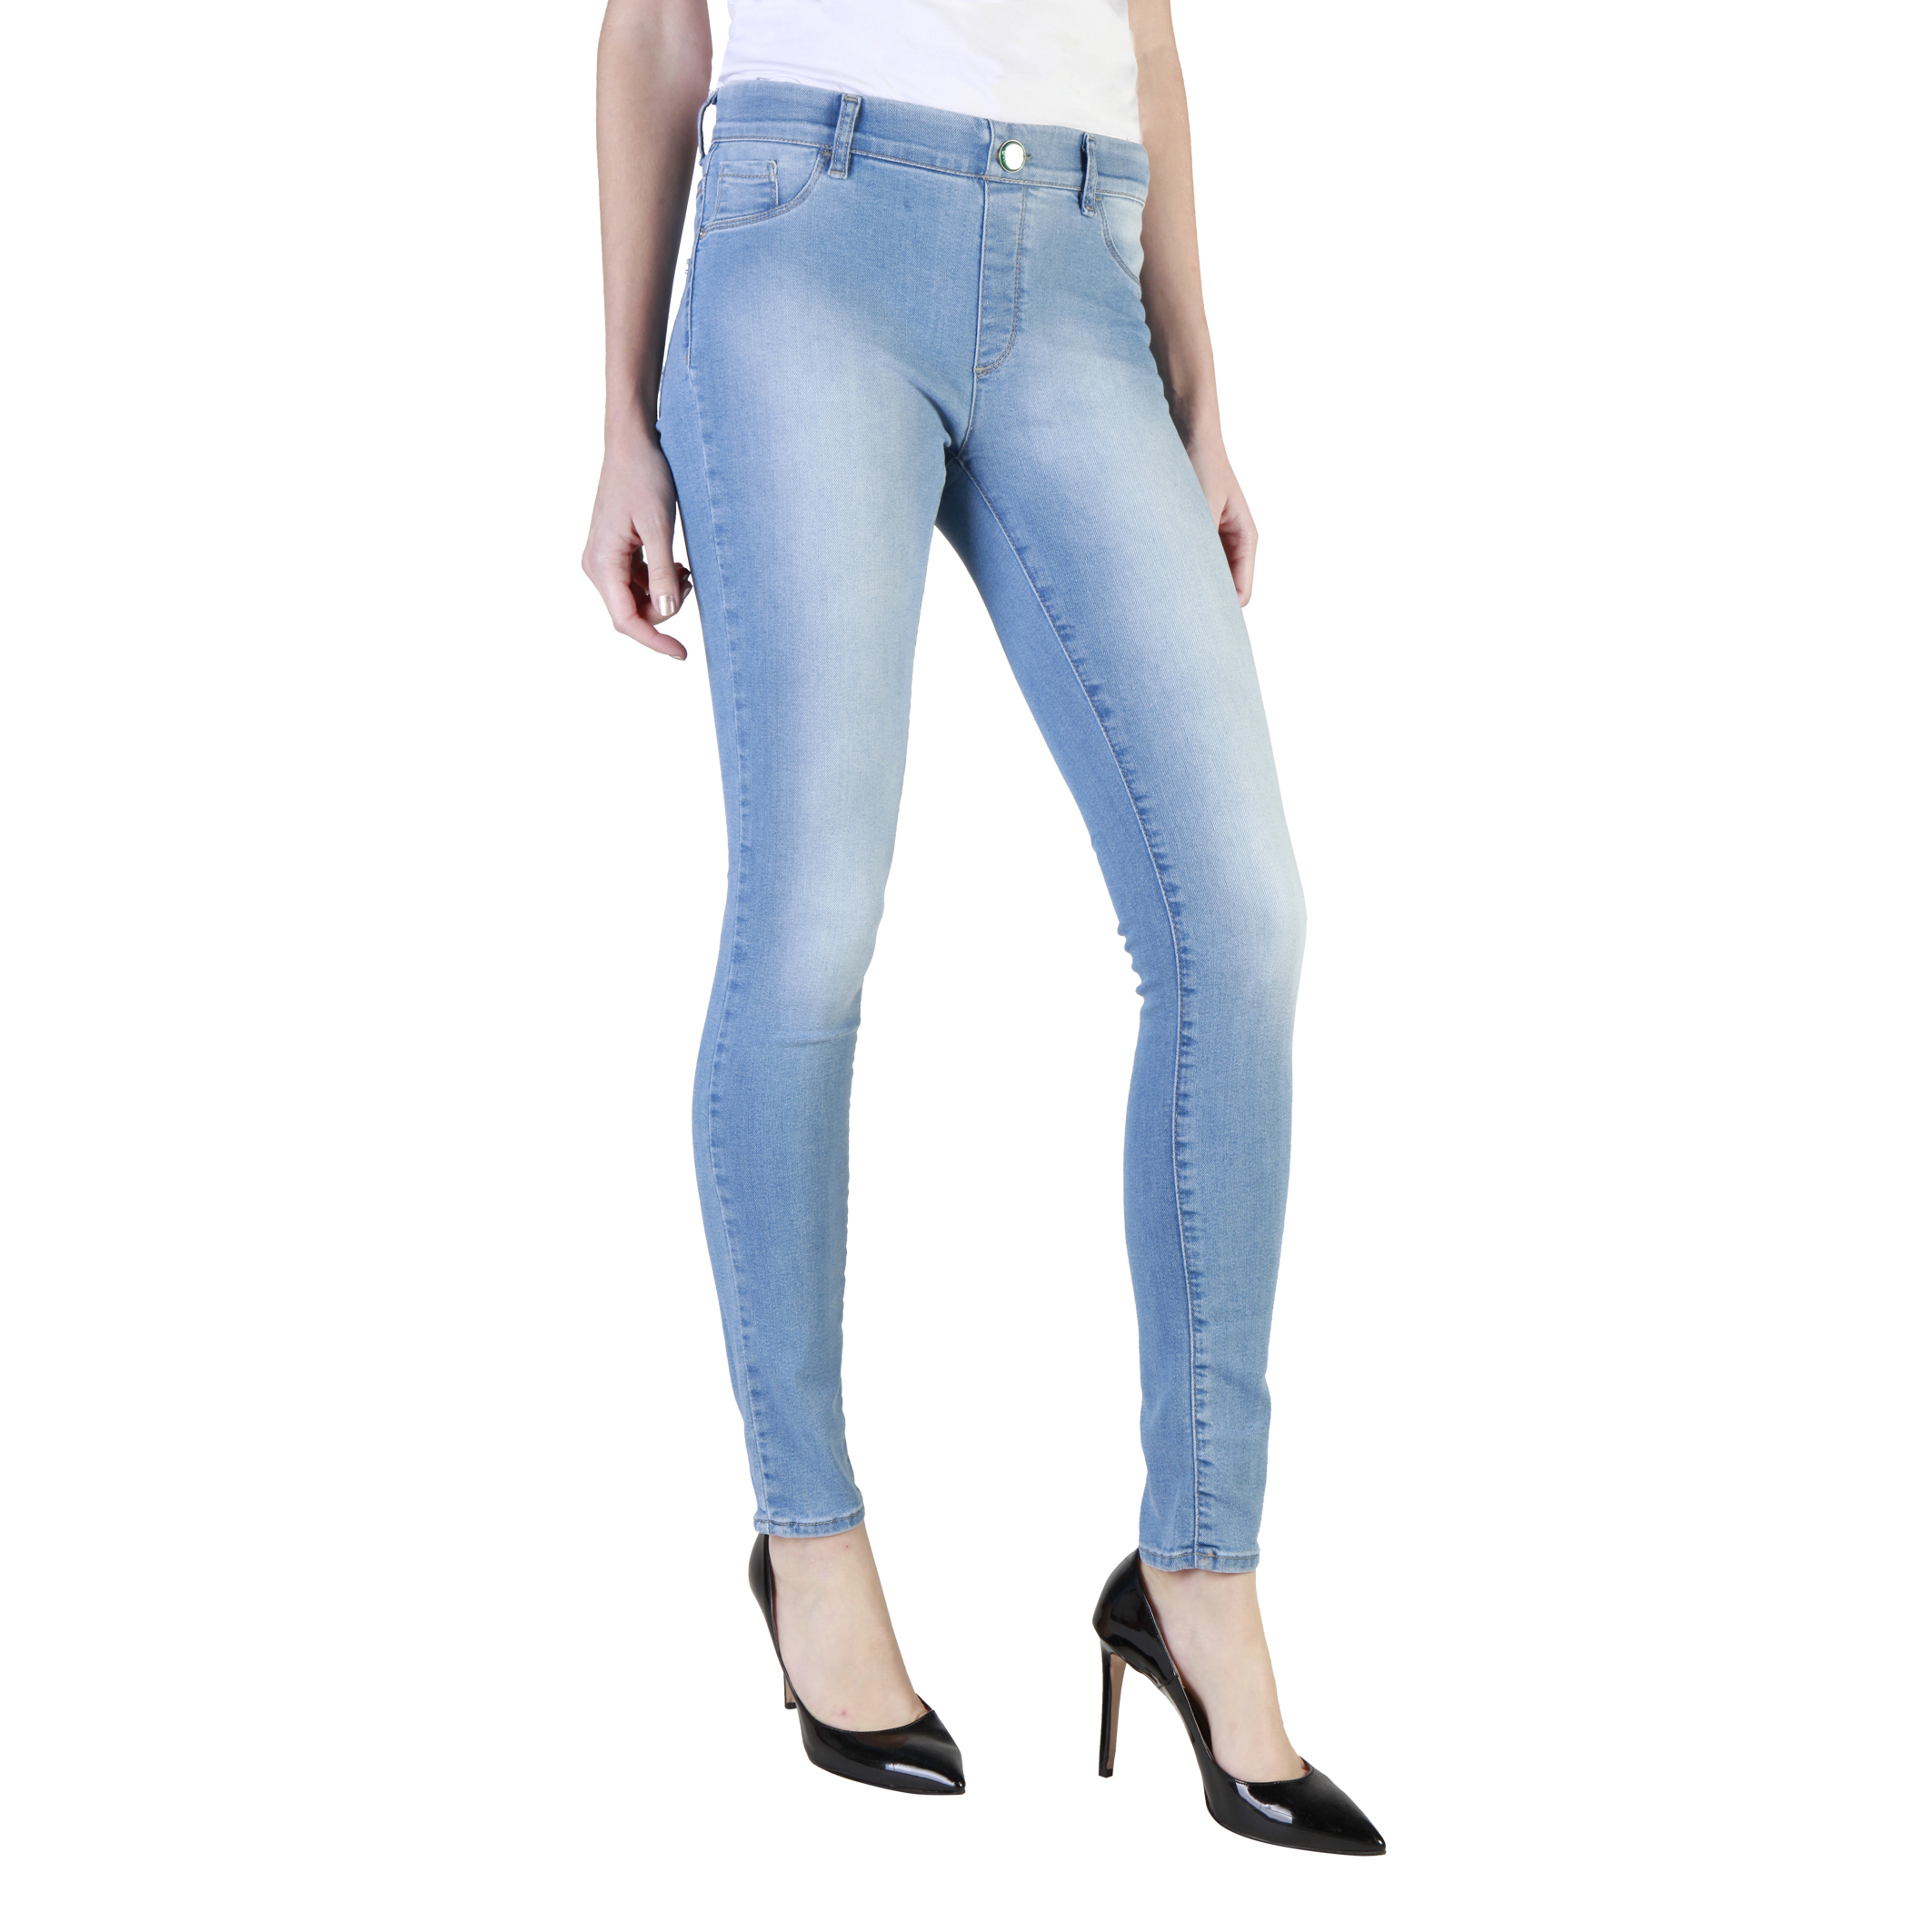 Jeans Carrera Jeans 00767L_822_ALOE Donna Blu 85312